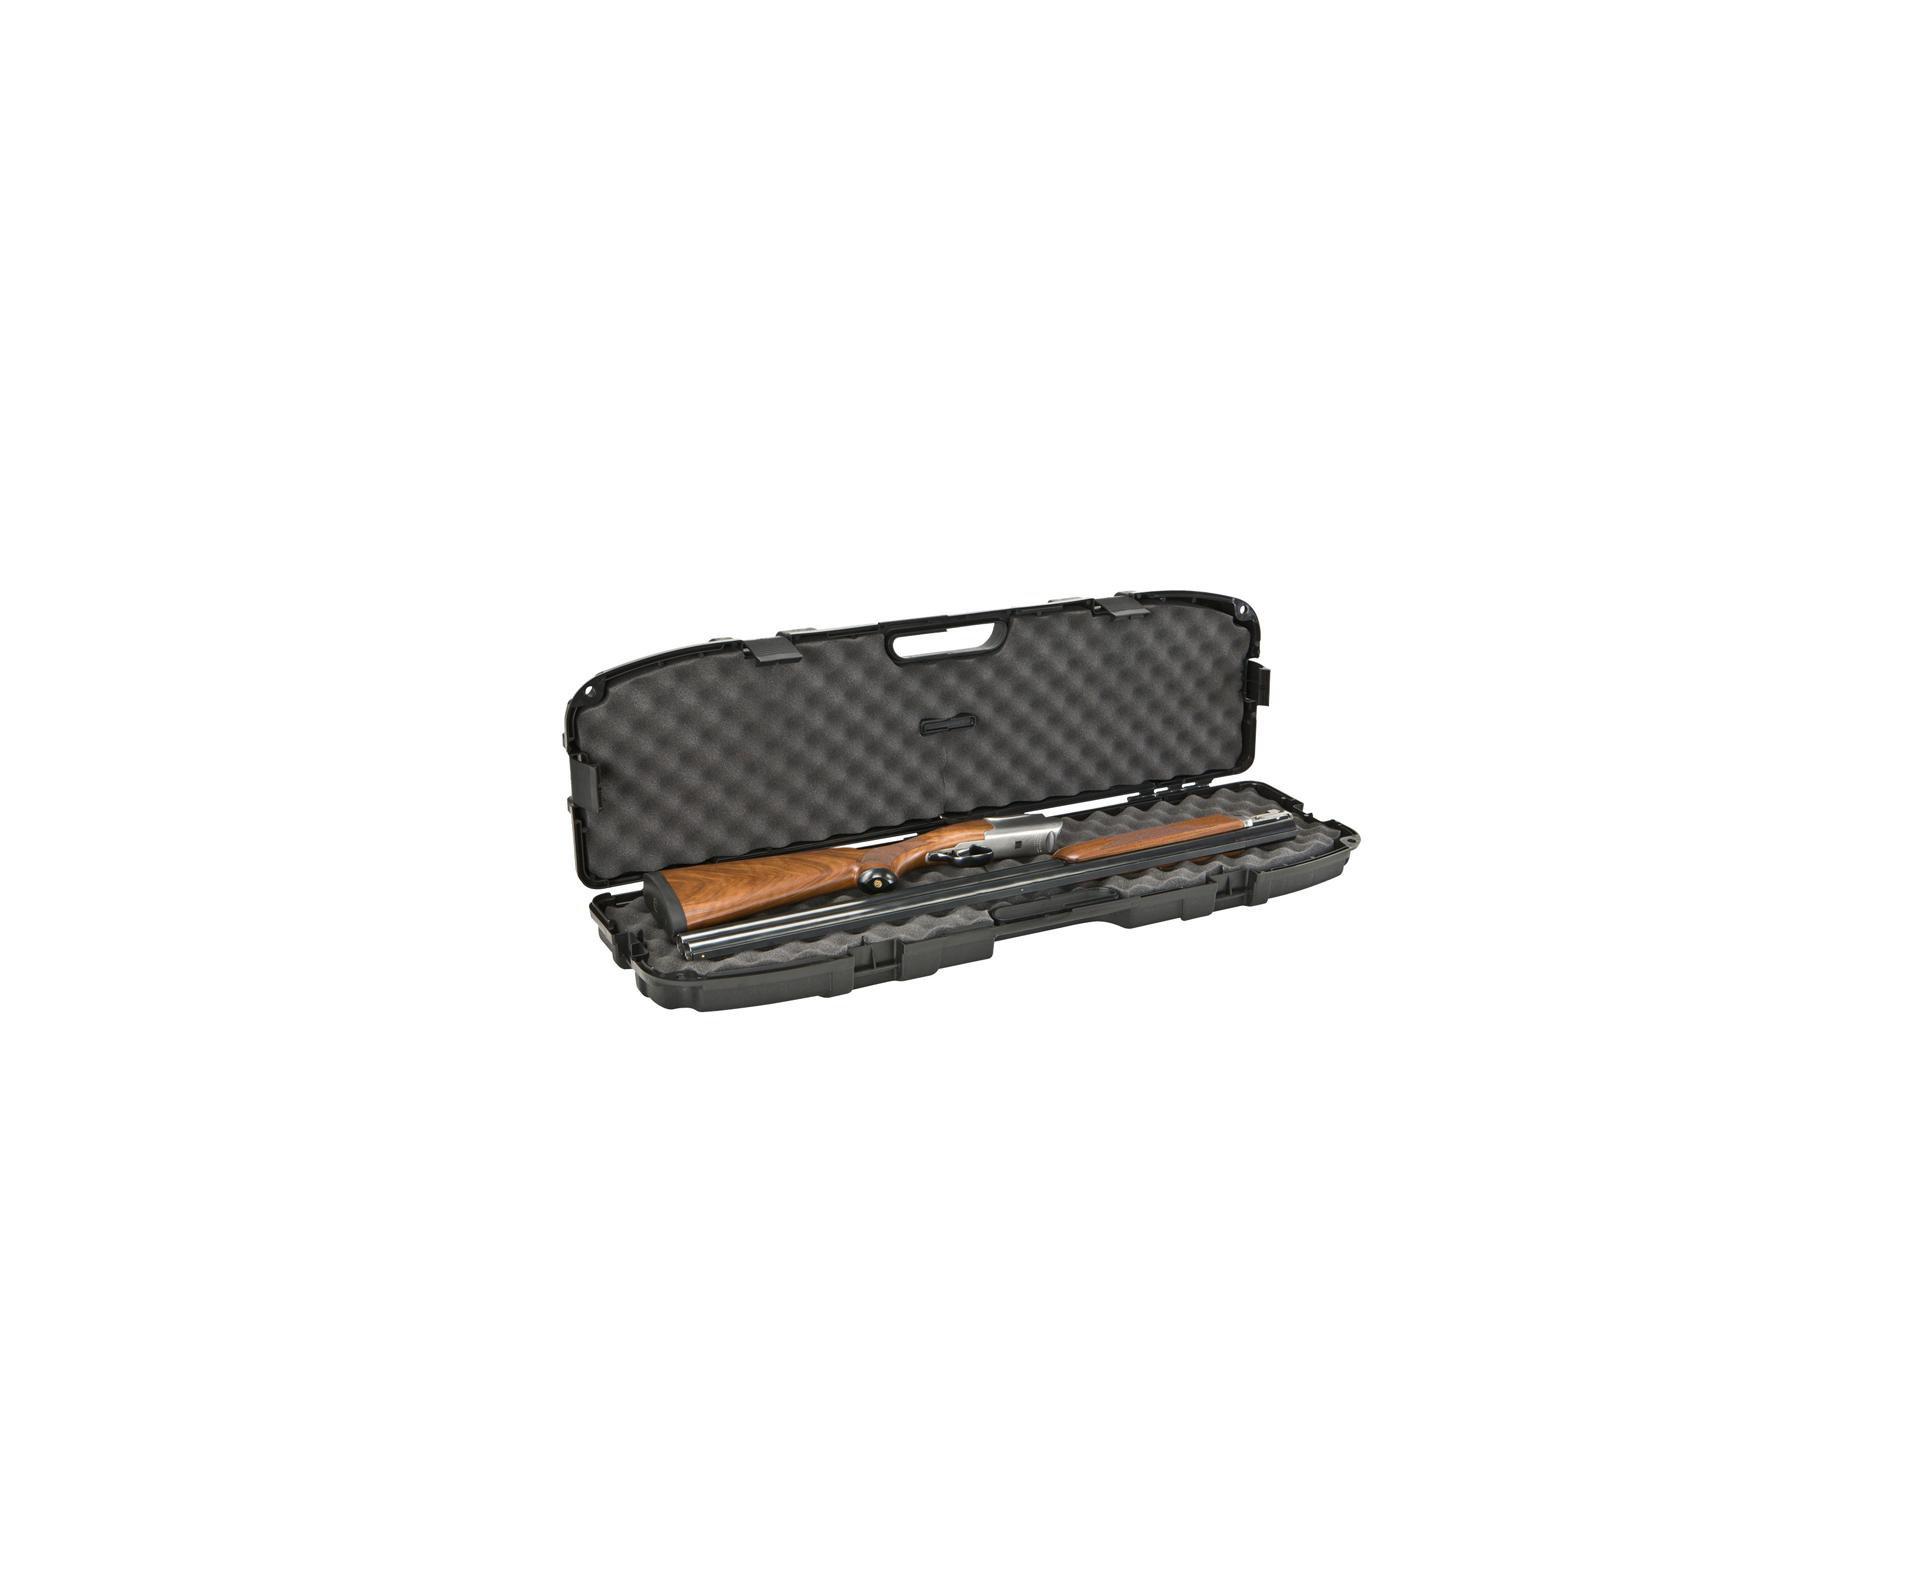 Caixa (case) Para Armas Longas - Pro-max 1535-00 - Plano